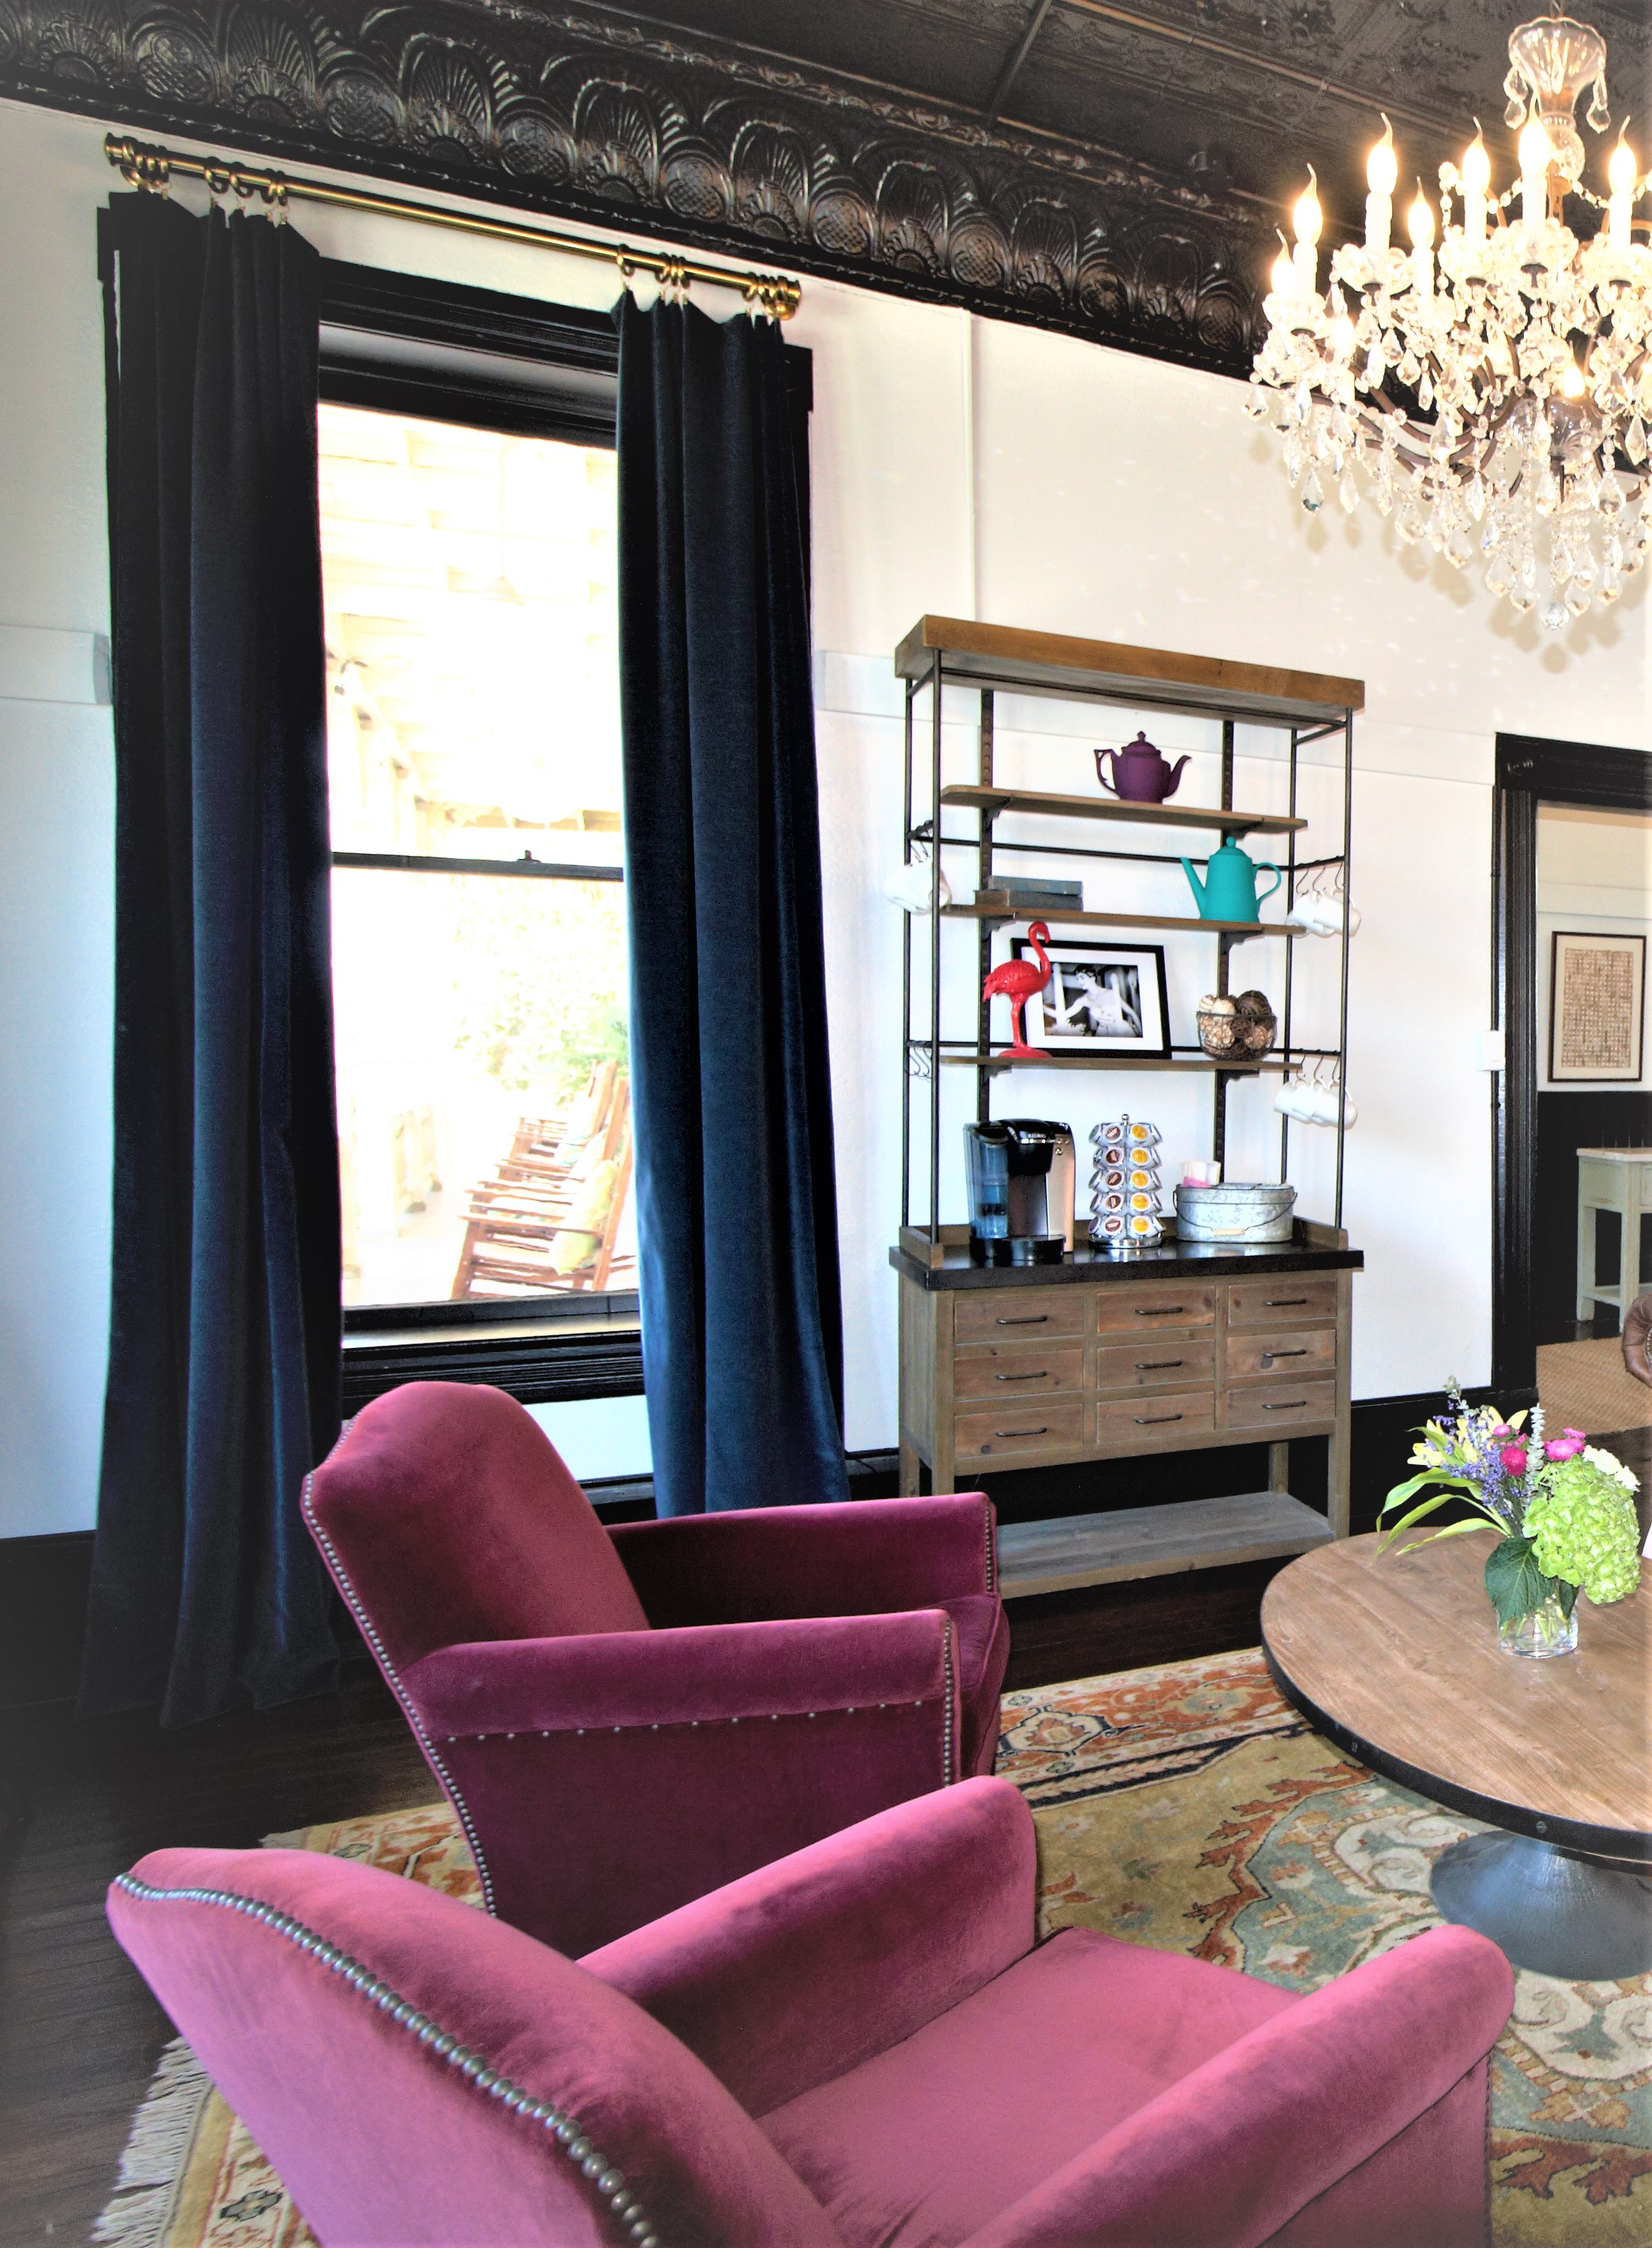 grand salon window with chairs enhanced.jpg